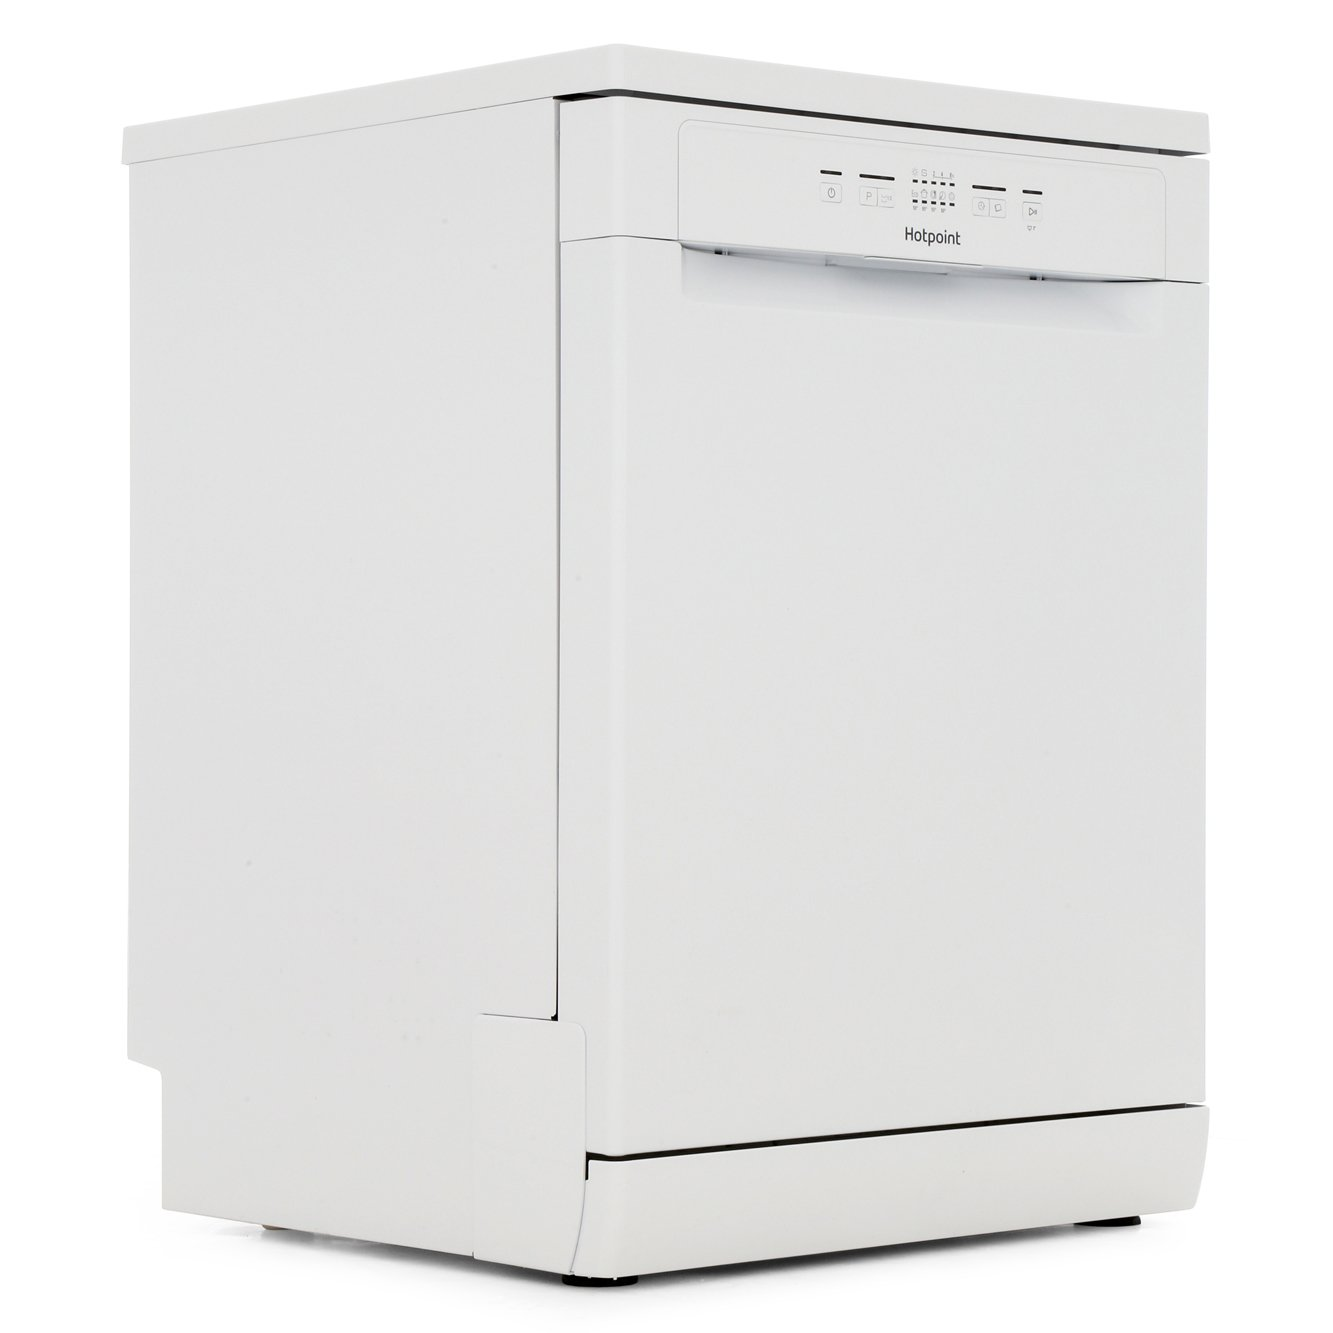 Hotpoint HFC2B19 Dishwasher